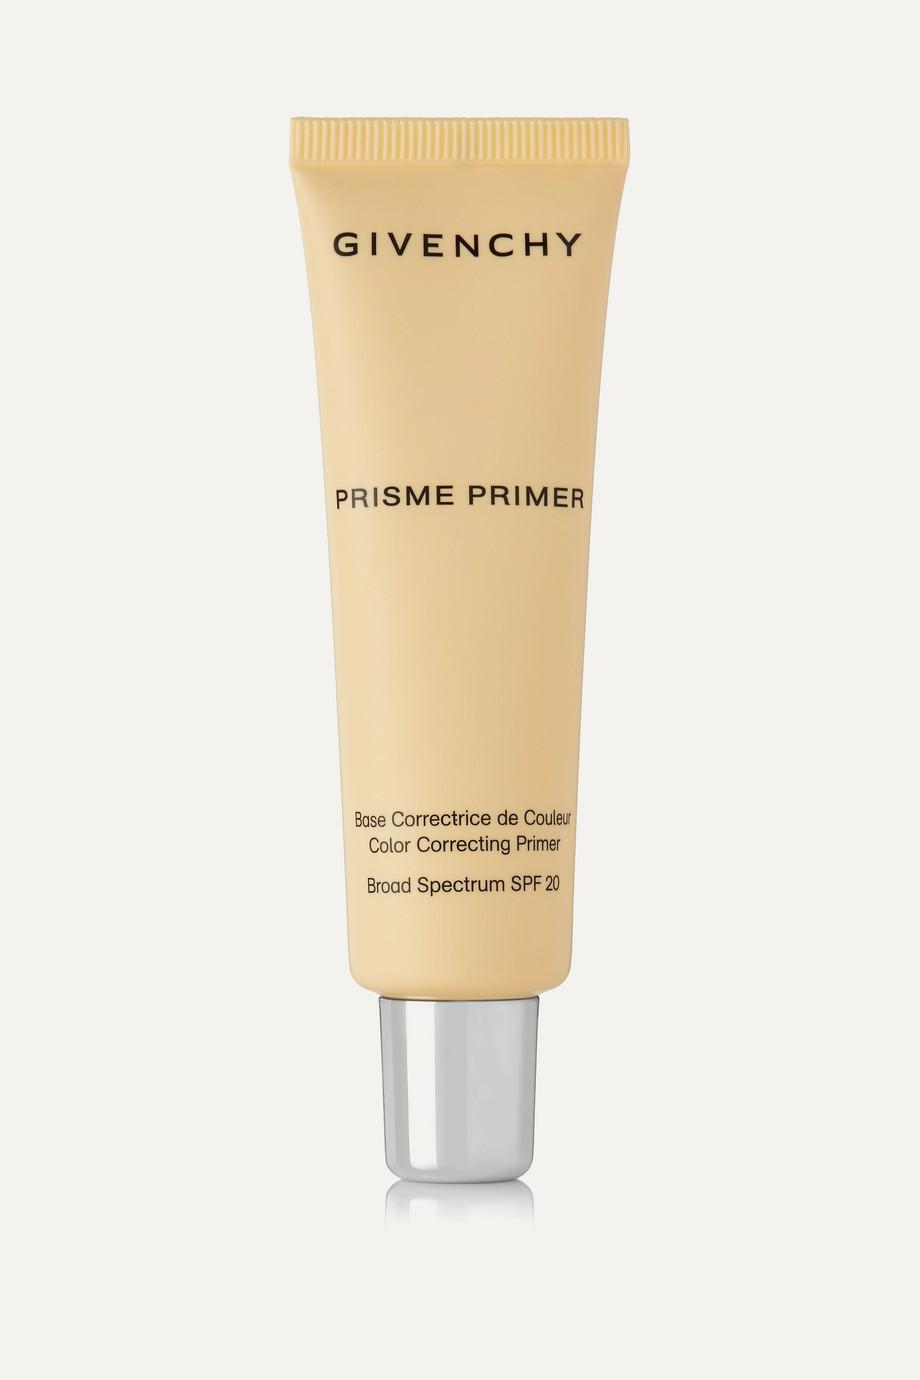 Givenchy Beauty Prisme Primer SPF20 - Jaune No. 3, 30ml